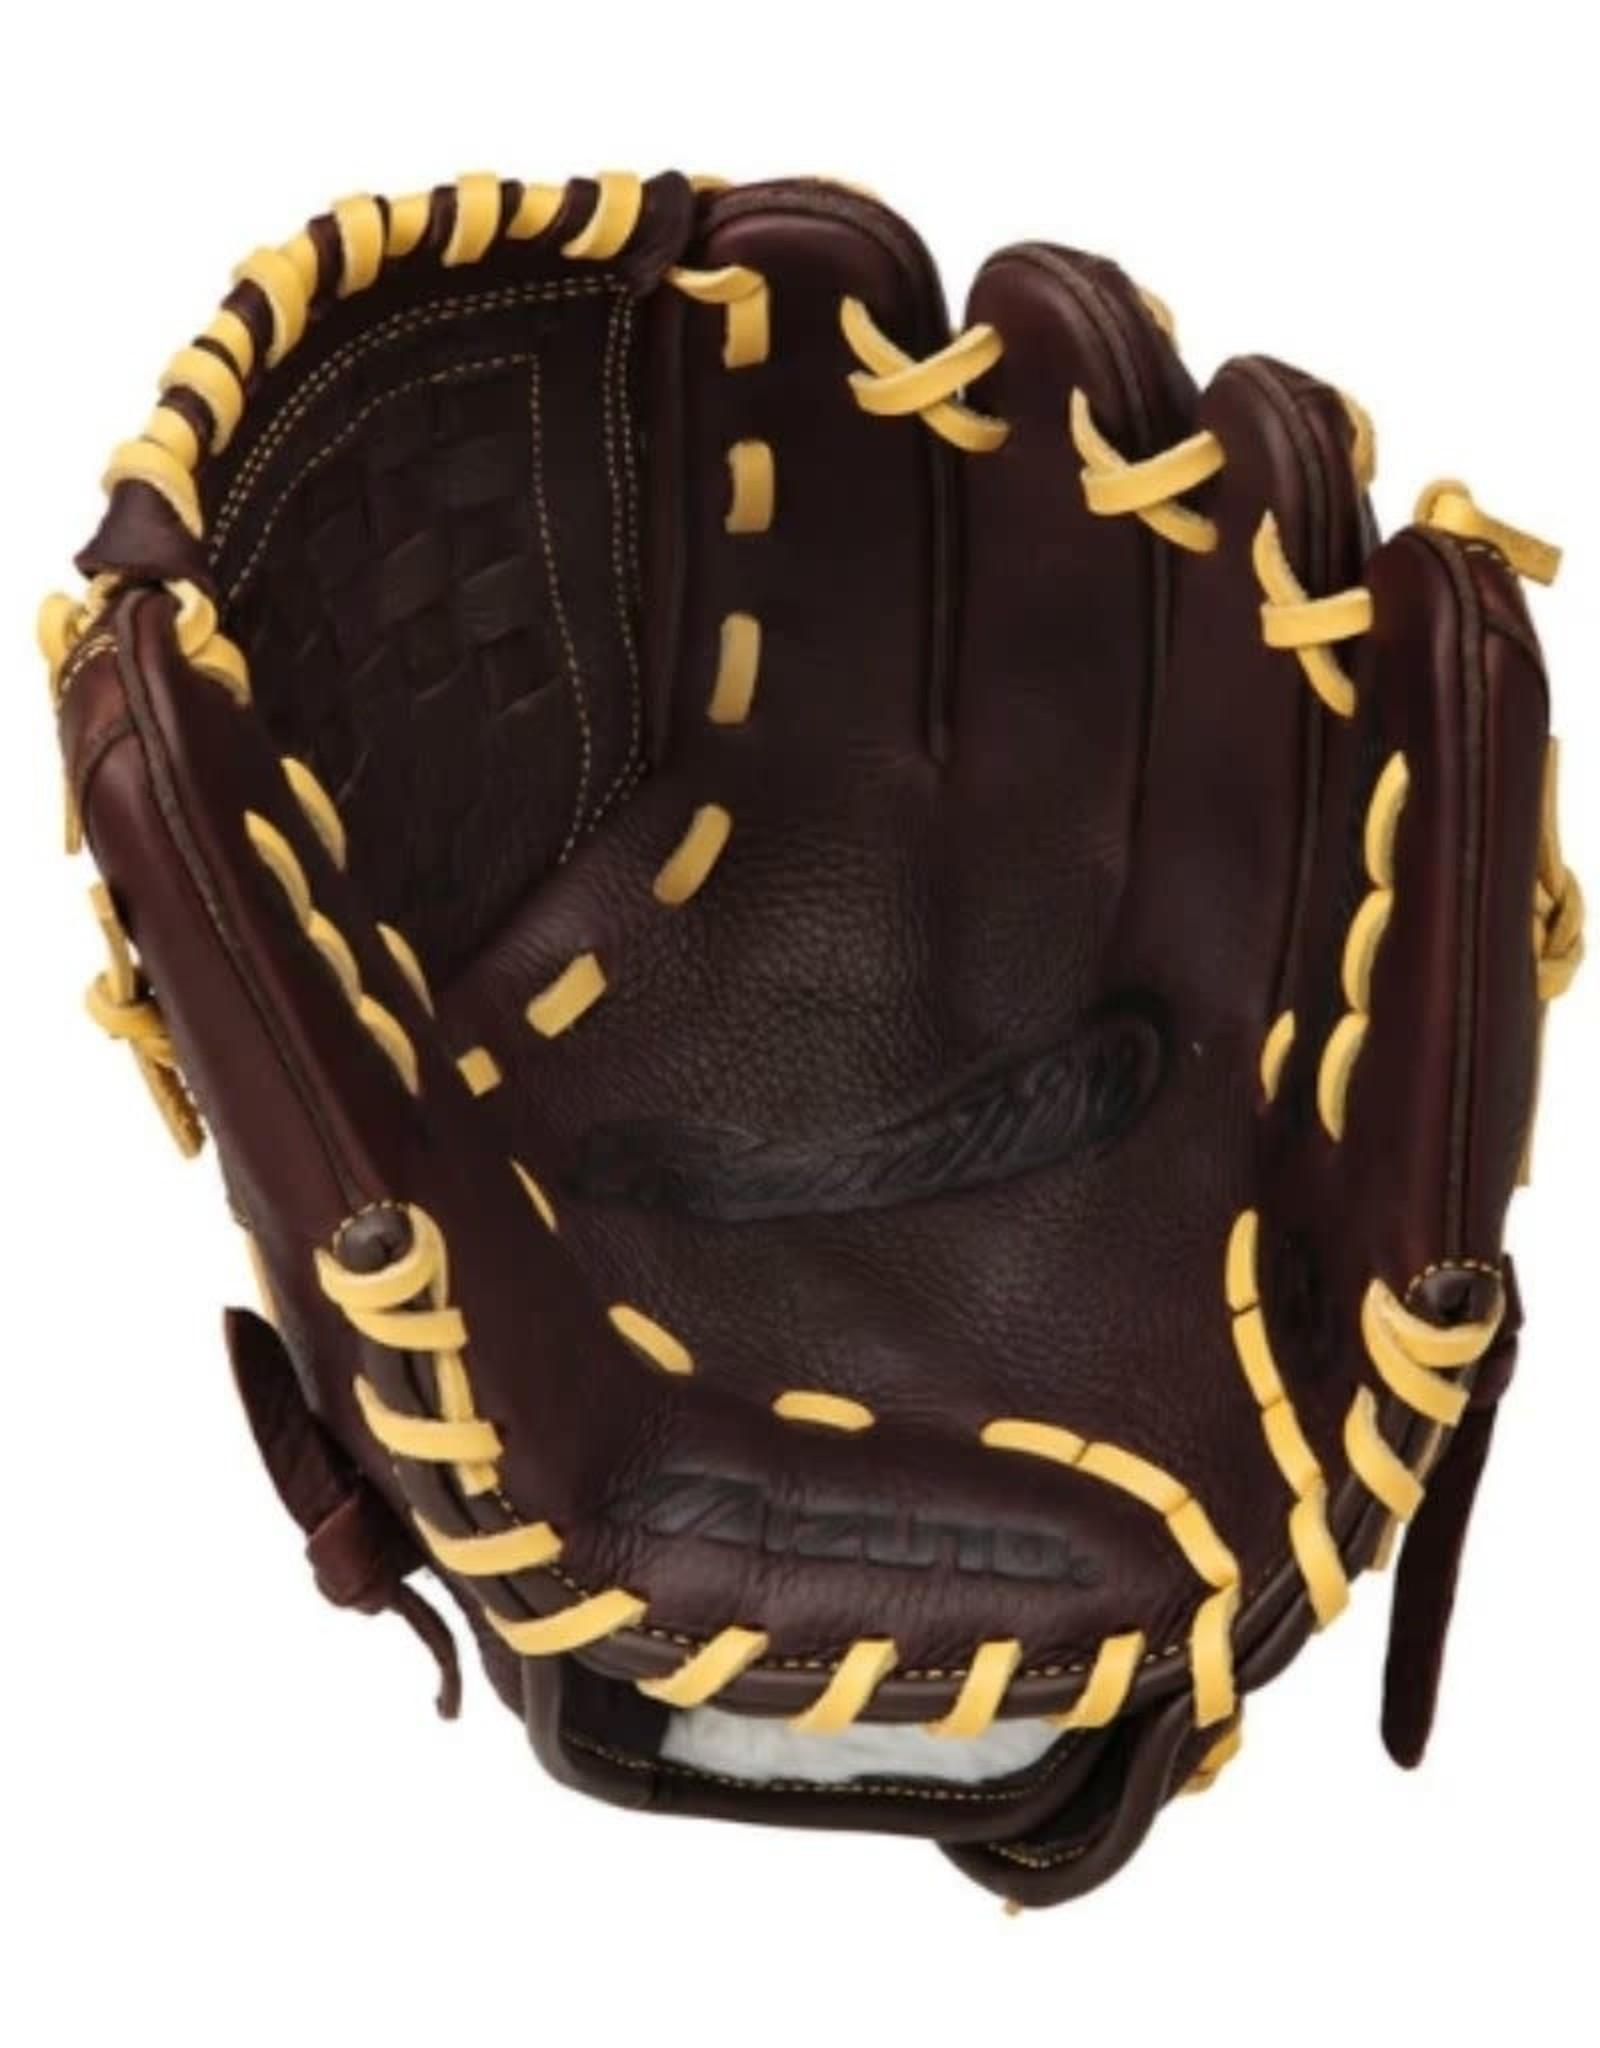 Mizuno Franchise Glove Brown 11